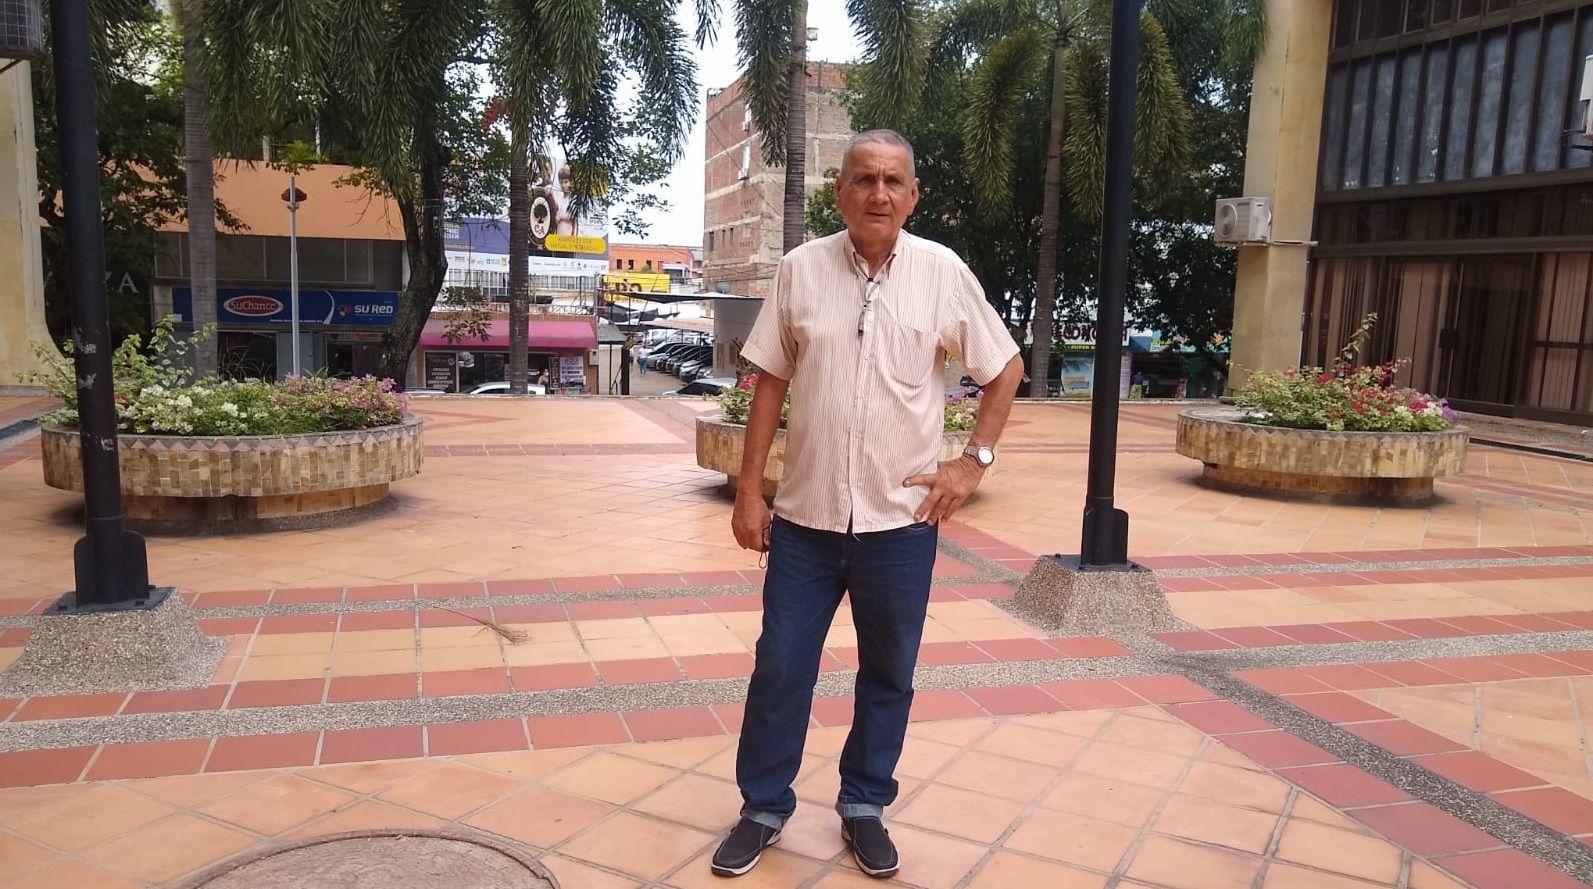 Herminson Ceferino Medina: la radio, el arbitraje y gozarse la vida